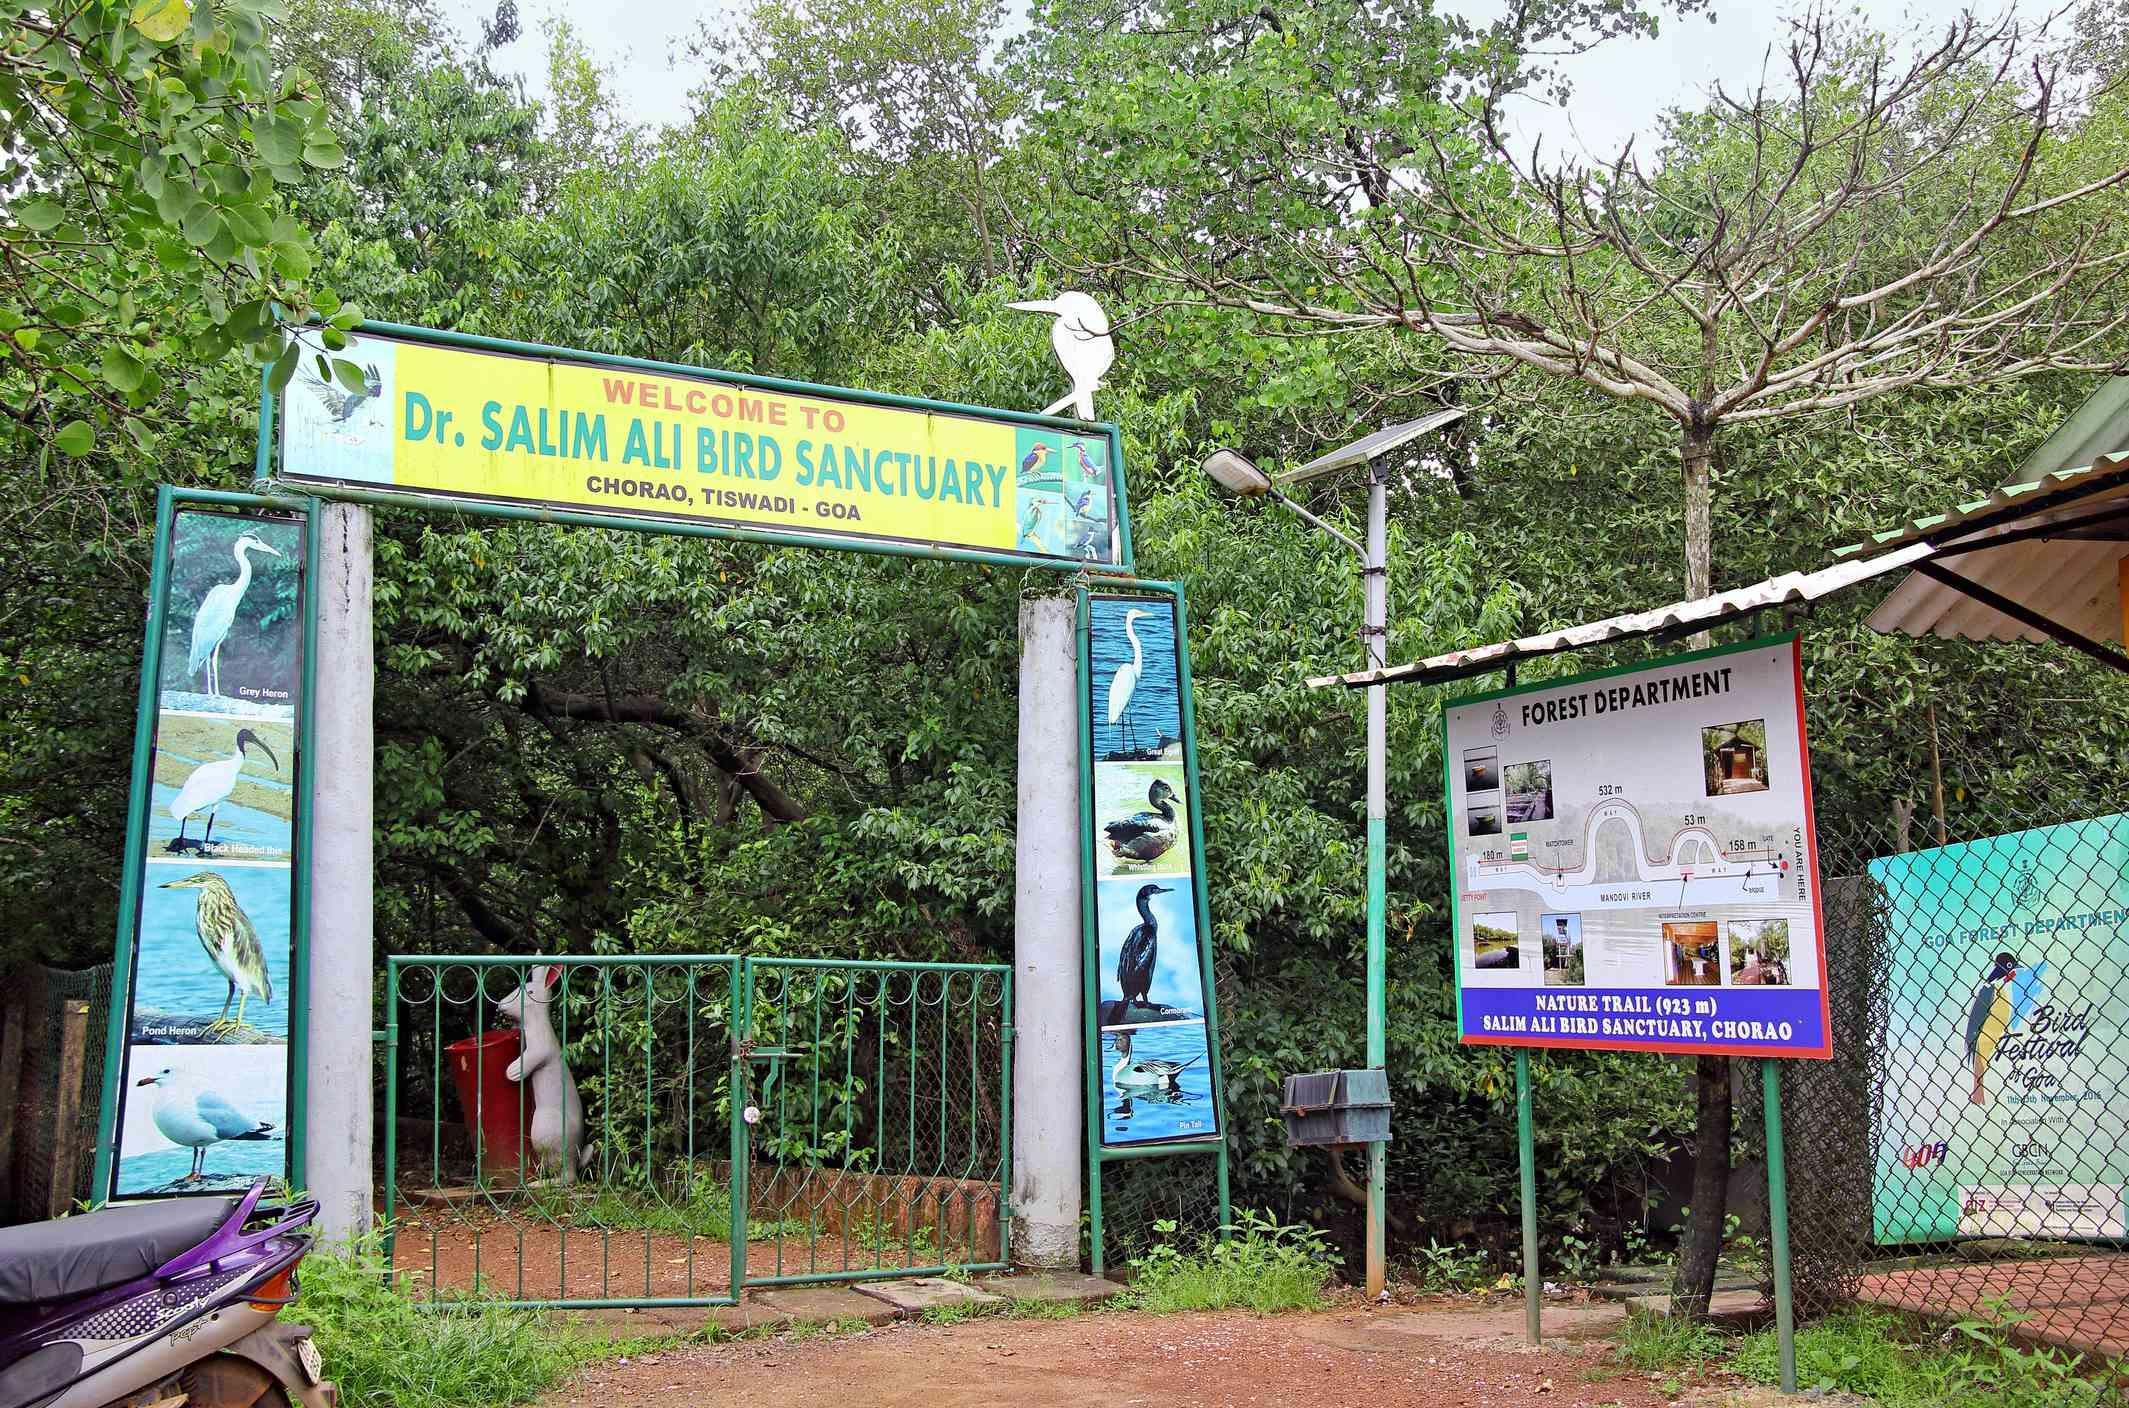 Entrance to Salim Ali Bird Sanctuary